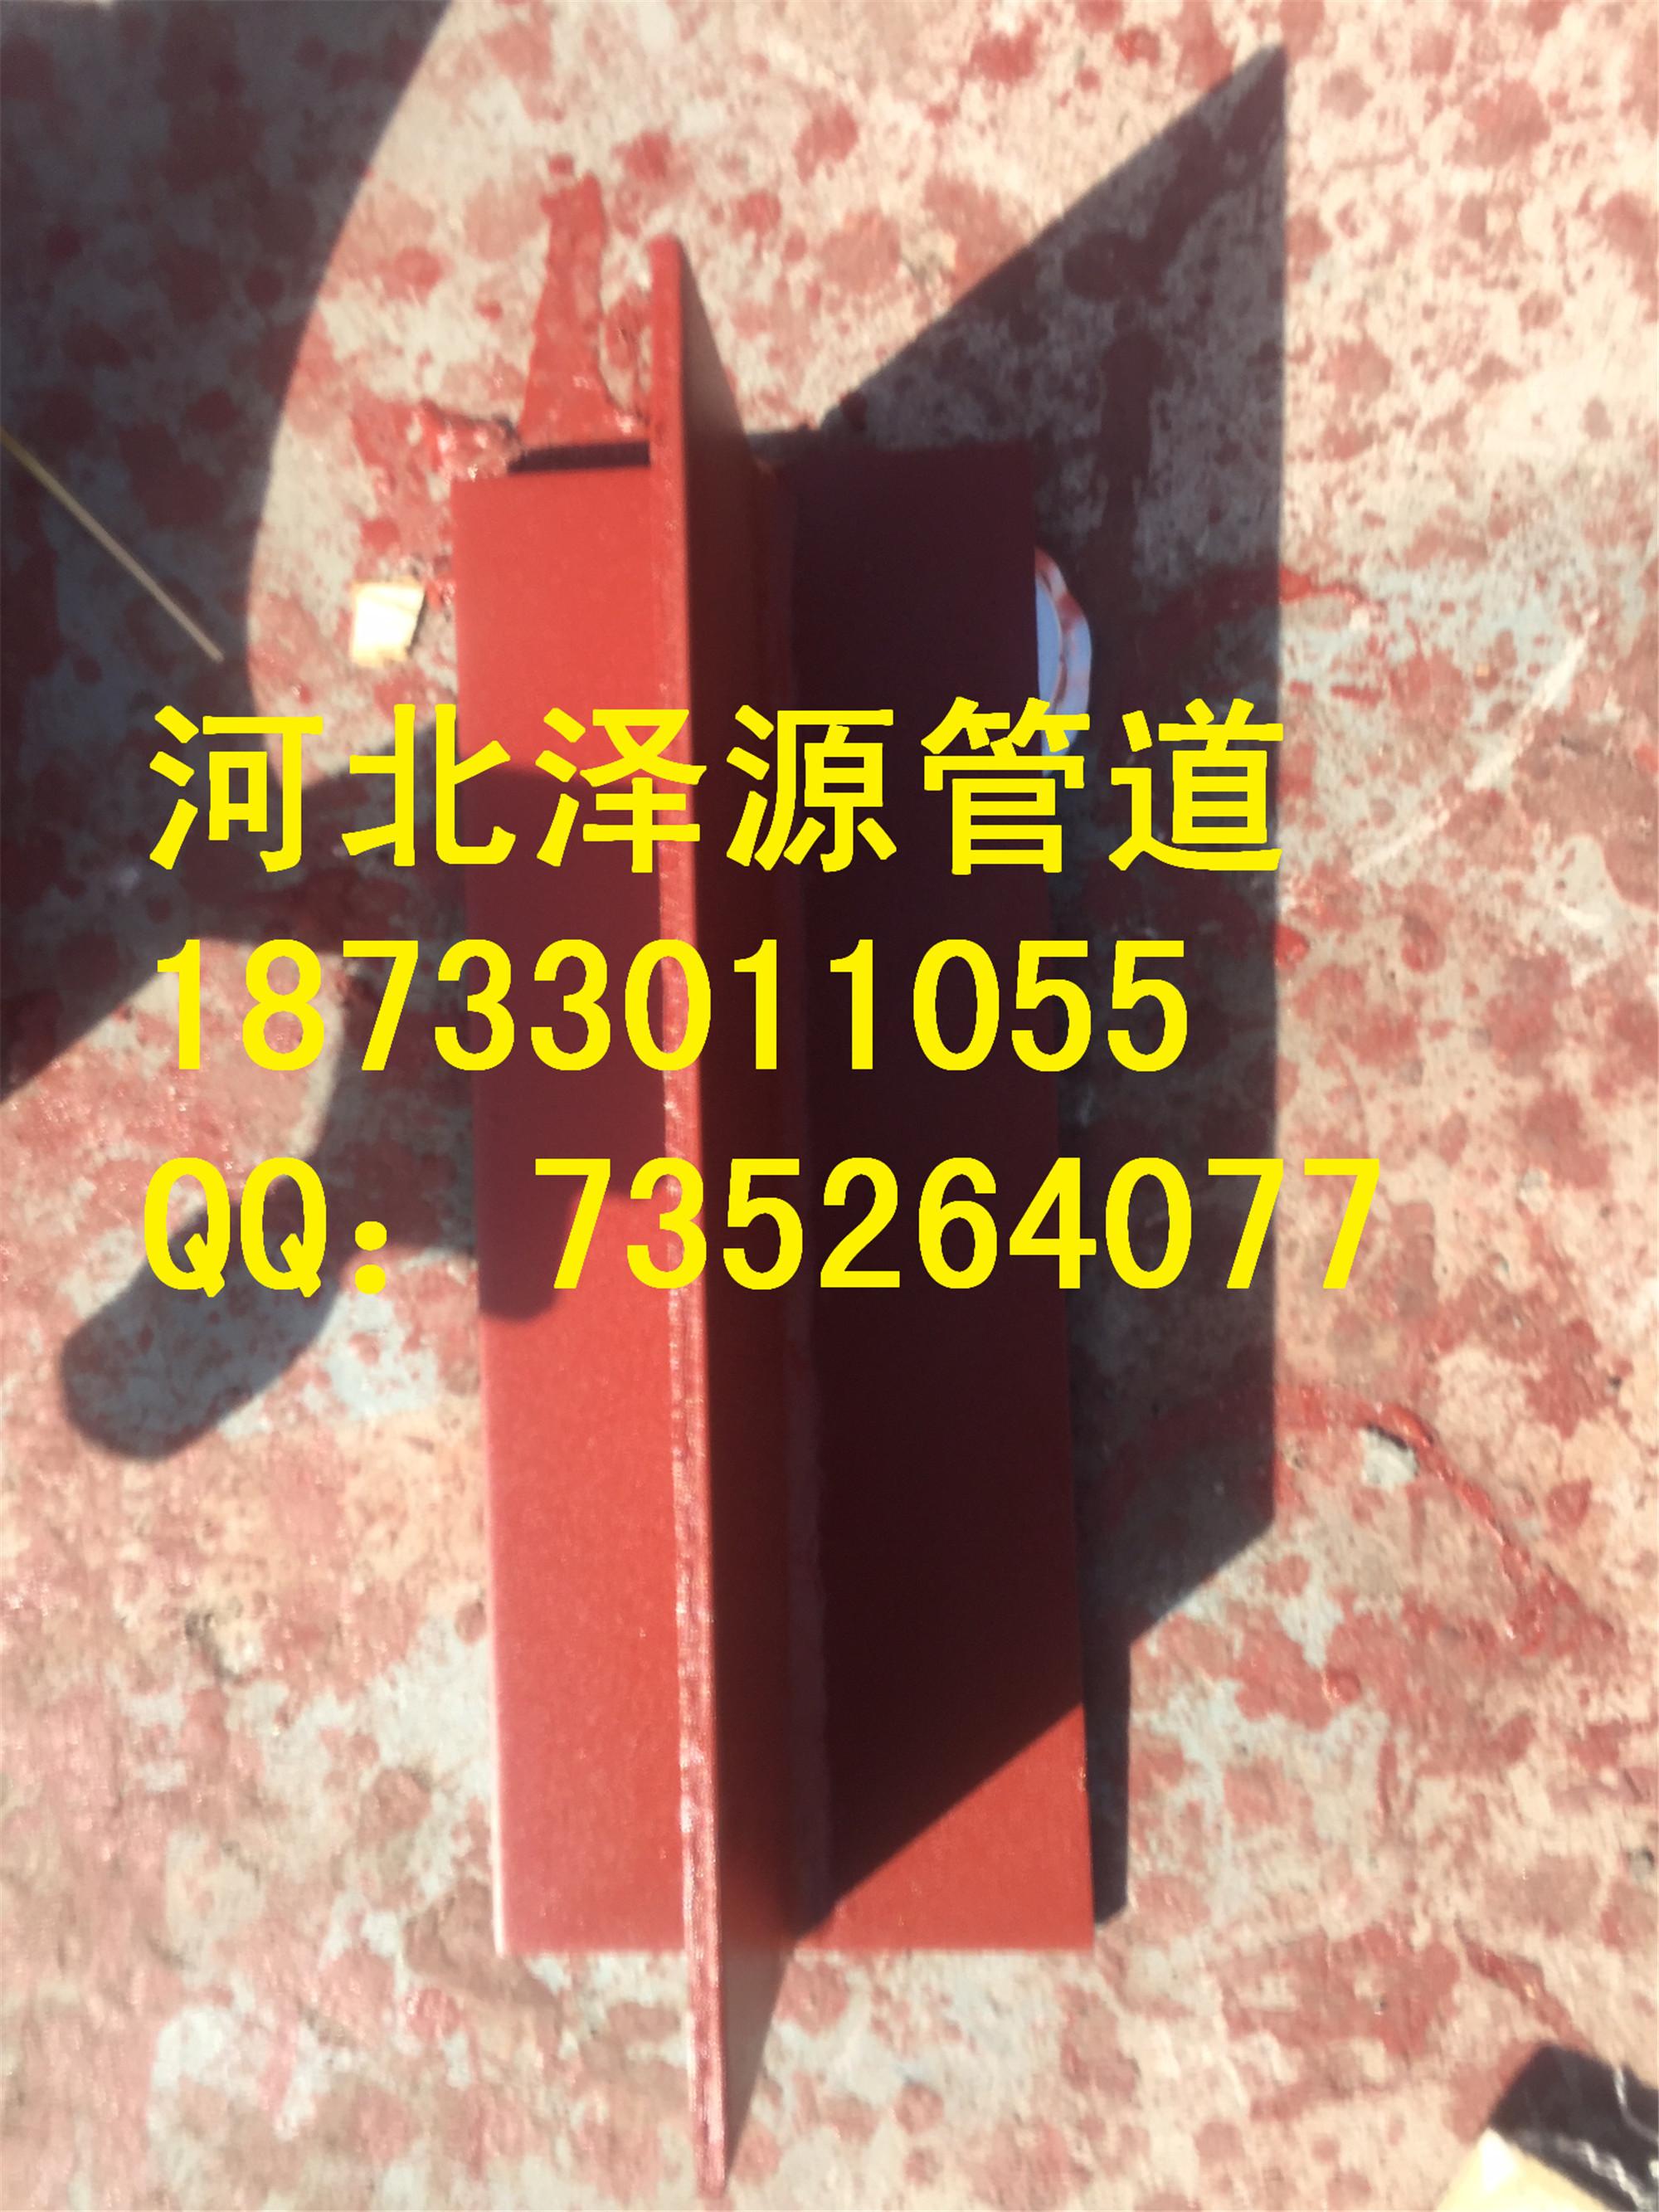 T型管托(焊接型)J1T型管托(焊接型)